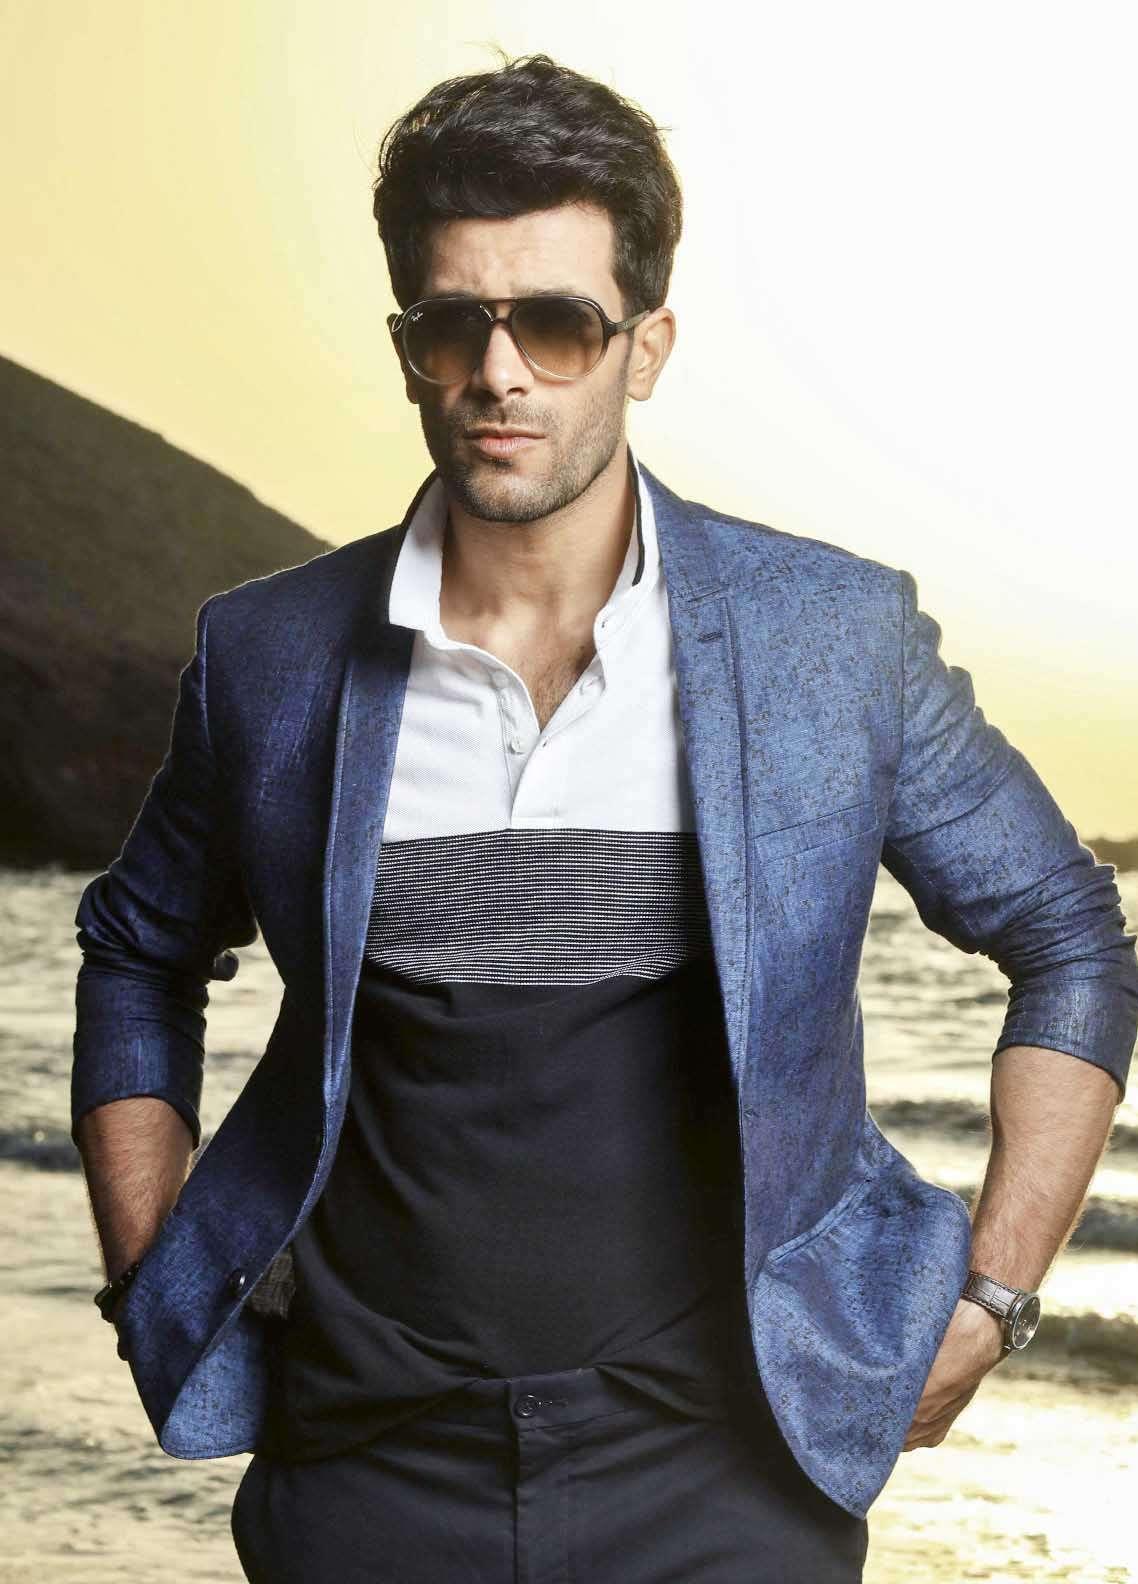 Edenrobe Cotton Casual Blazers for Men - Royal Blue EDM18B-6667